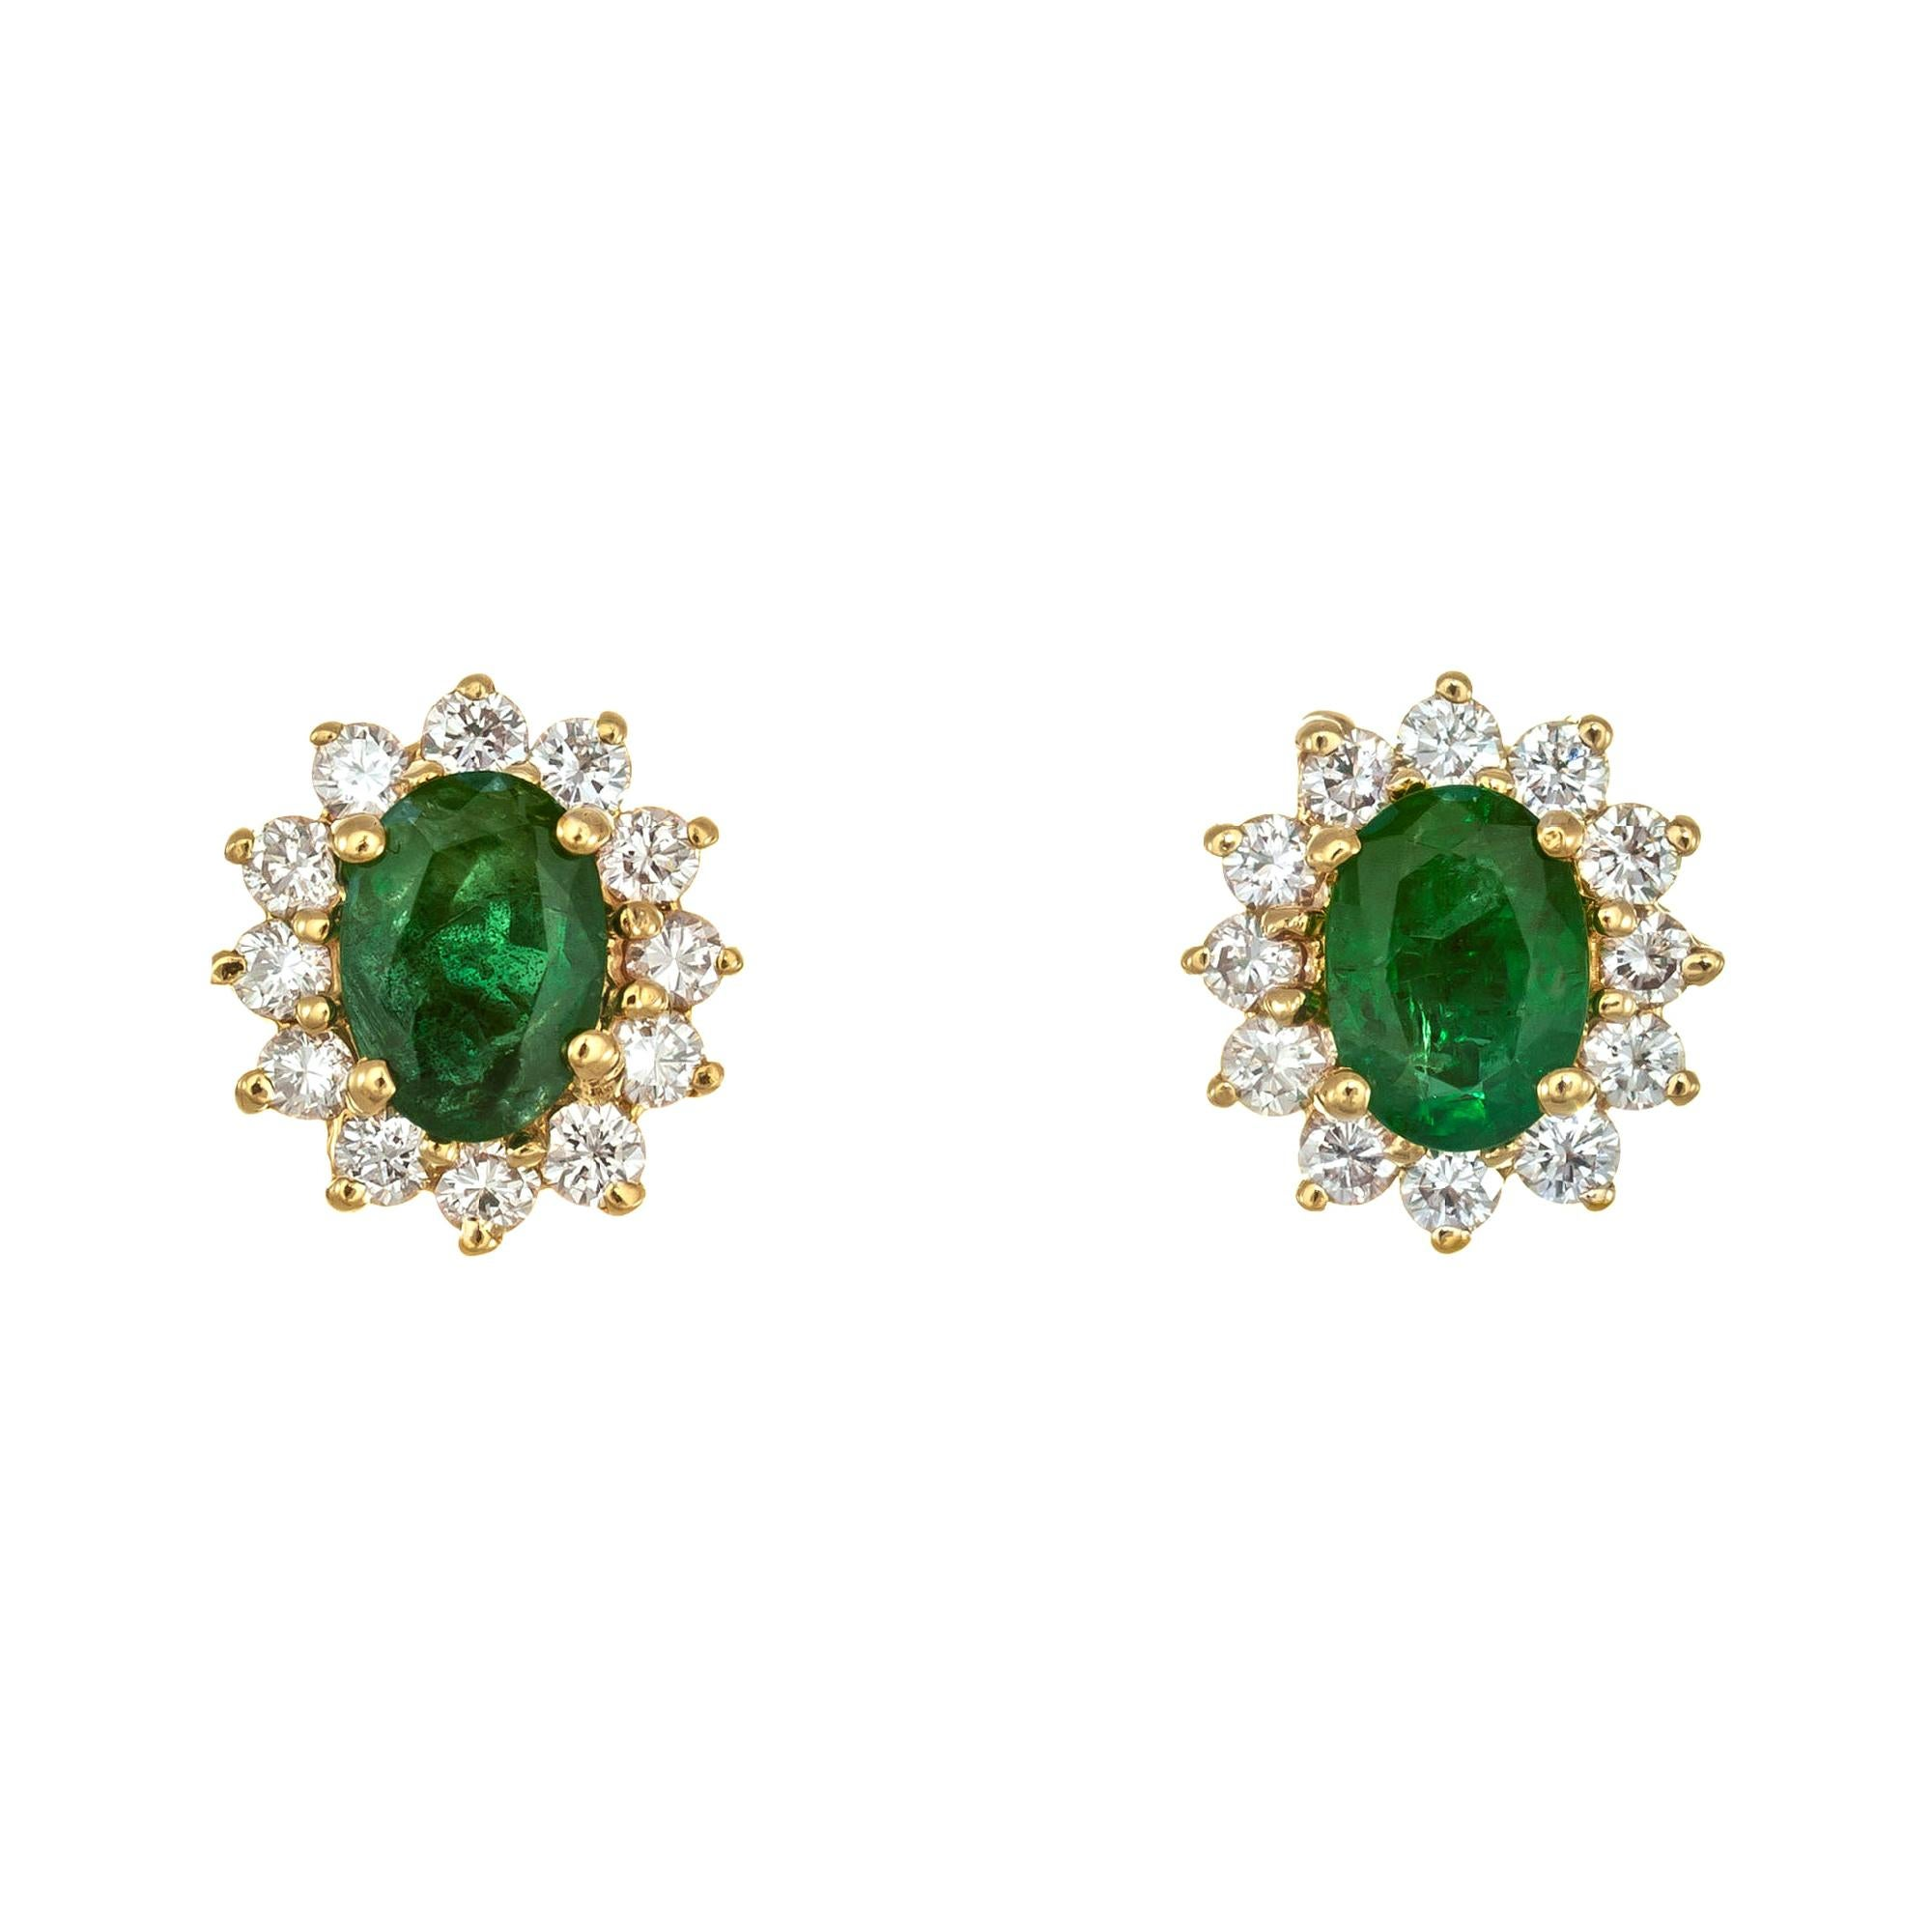 GIA Certified 1.00 Carat Emerald Diamond Yellow Gold Stud Earrings